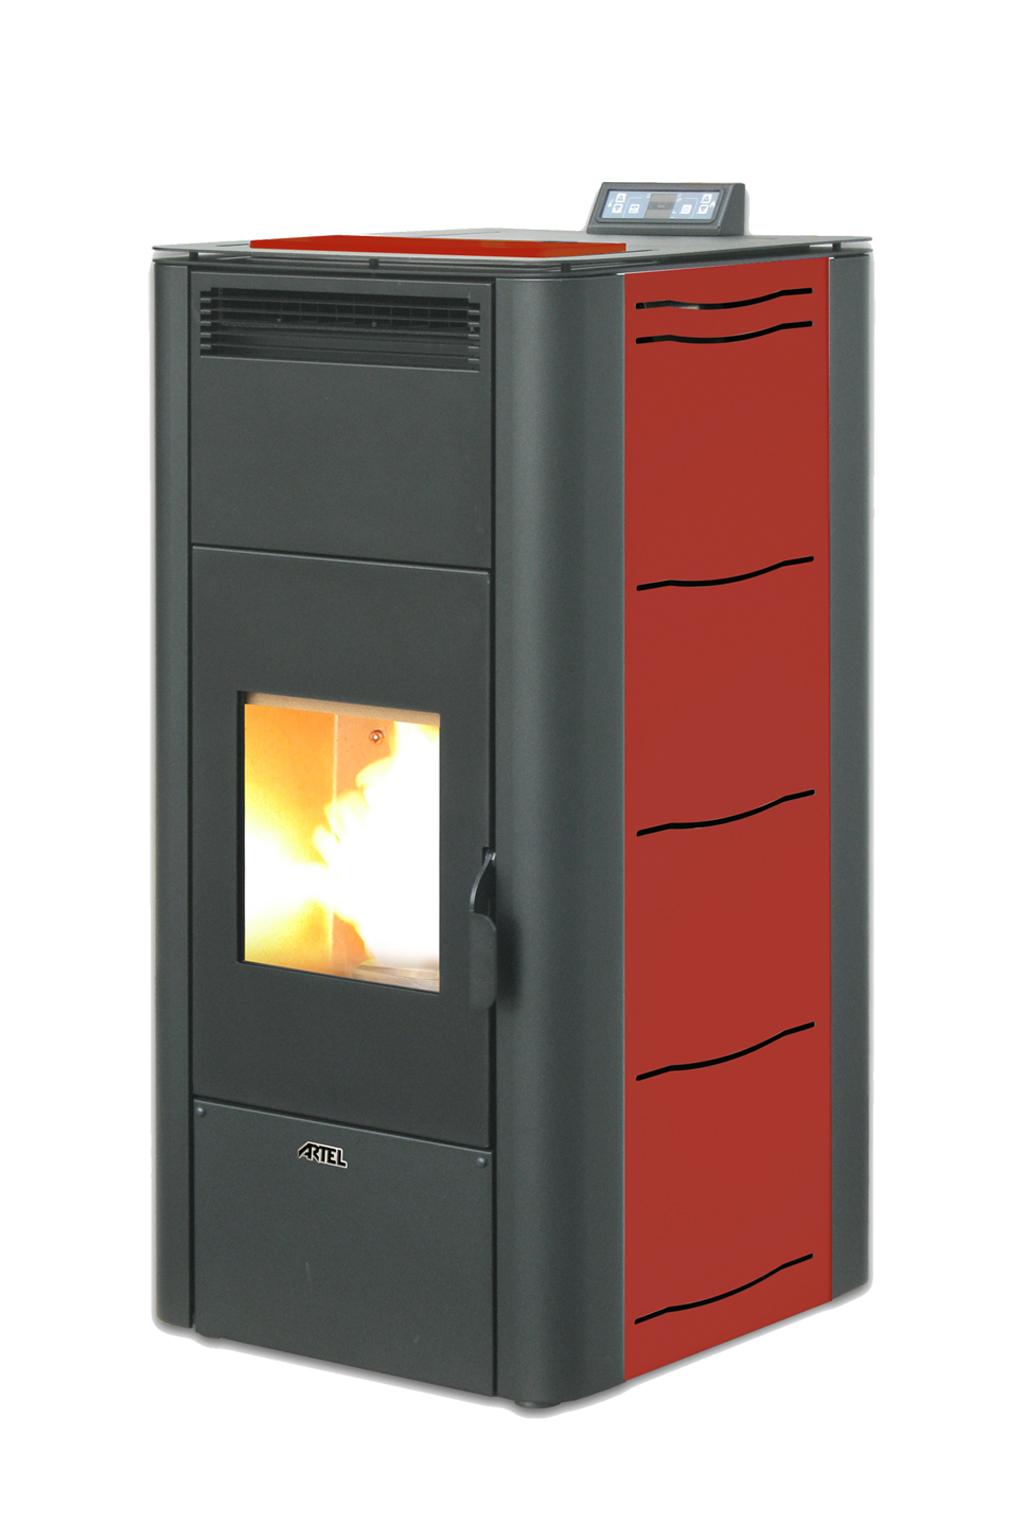 Pelletkachel CV 24 kW rood